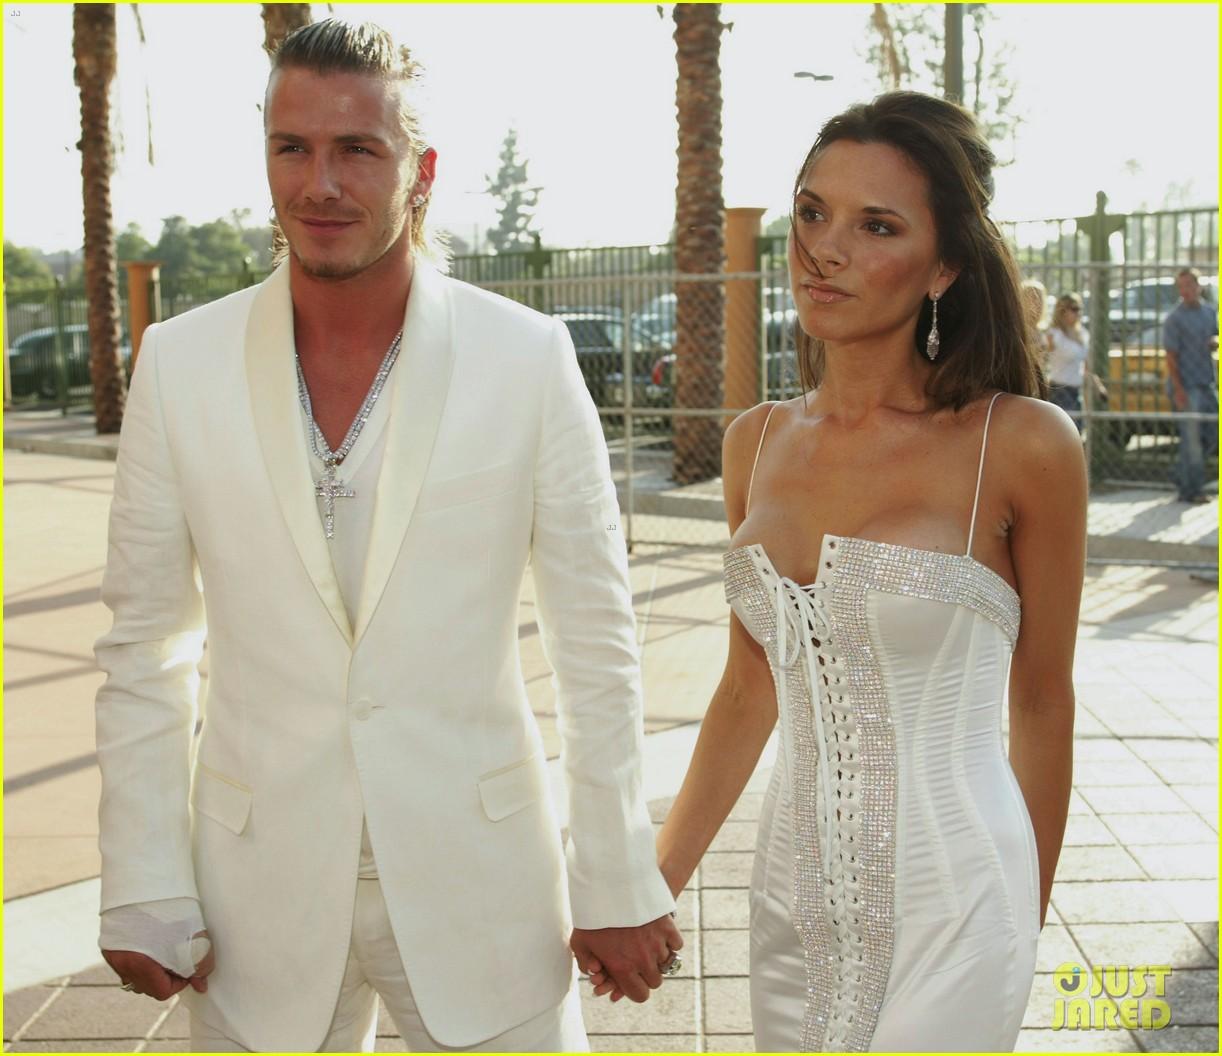 Victoria Beckham Wedding Dress Collection - Wedding Dress & Decore Ideas